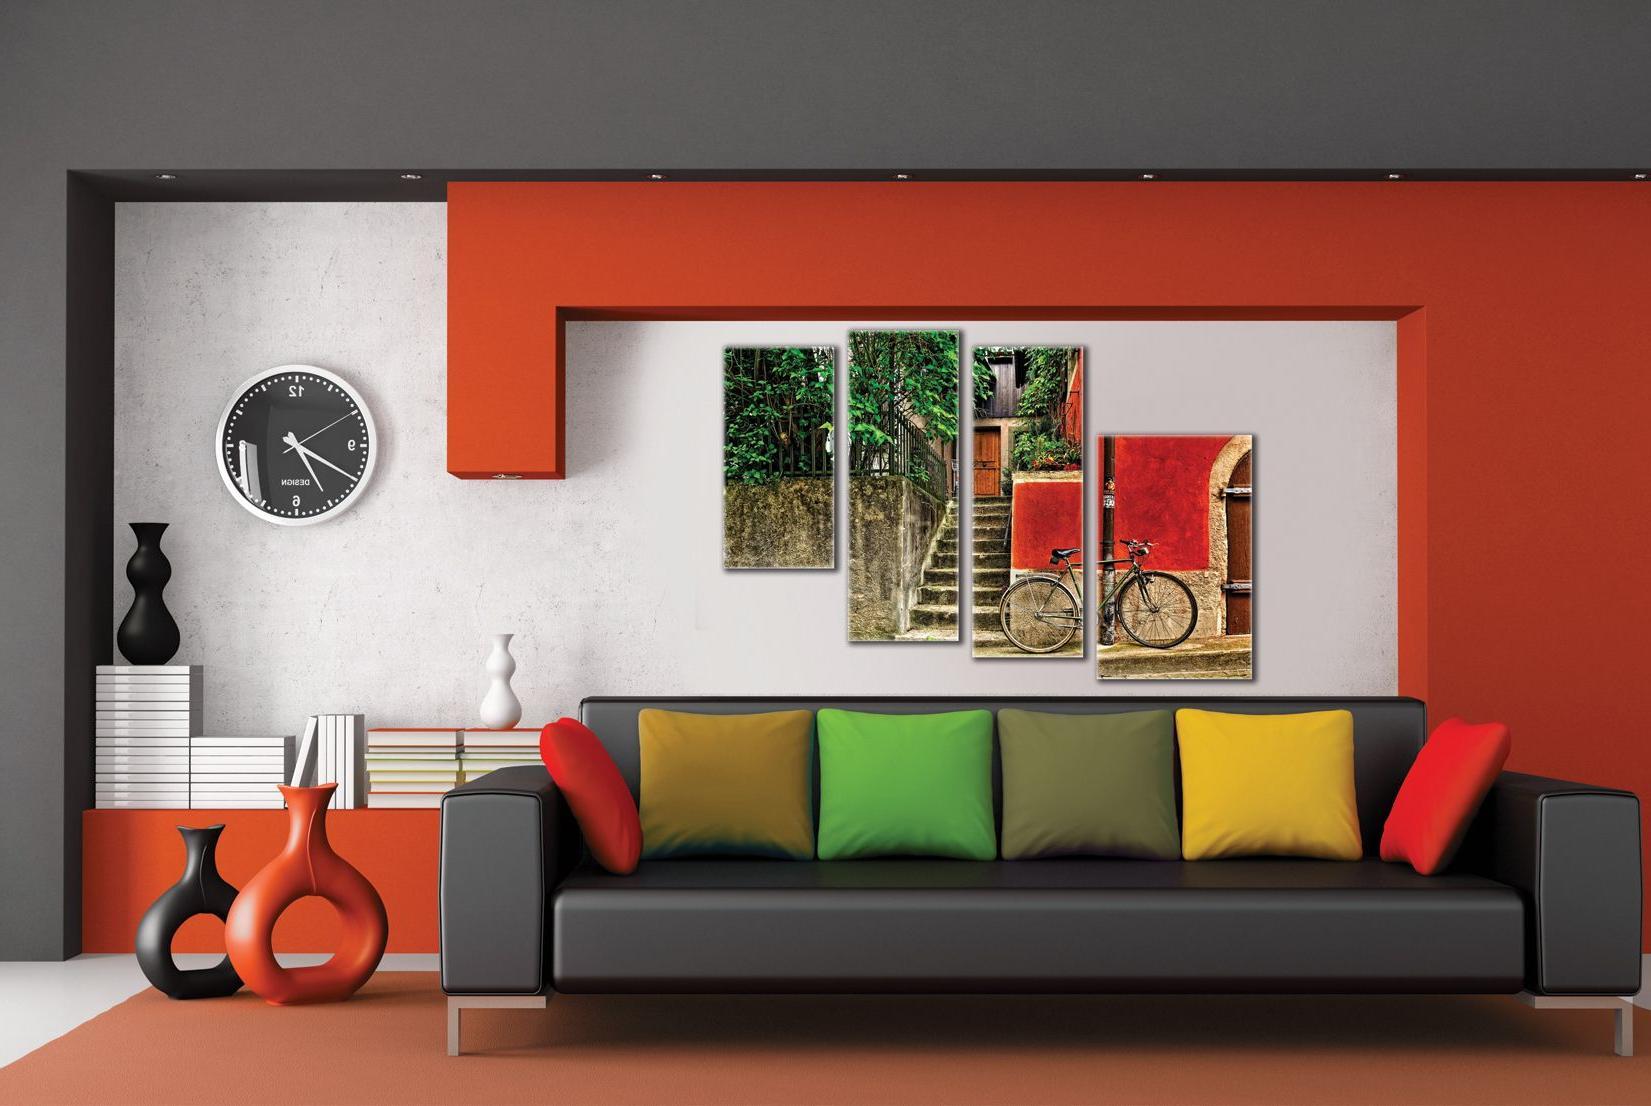 Постеры в интерьере модерн